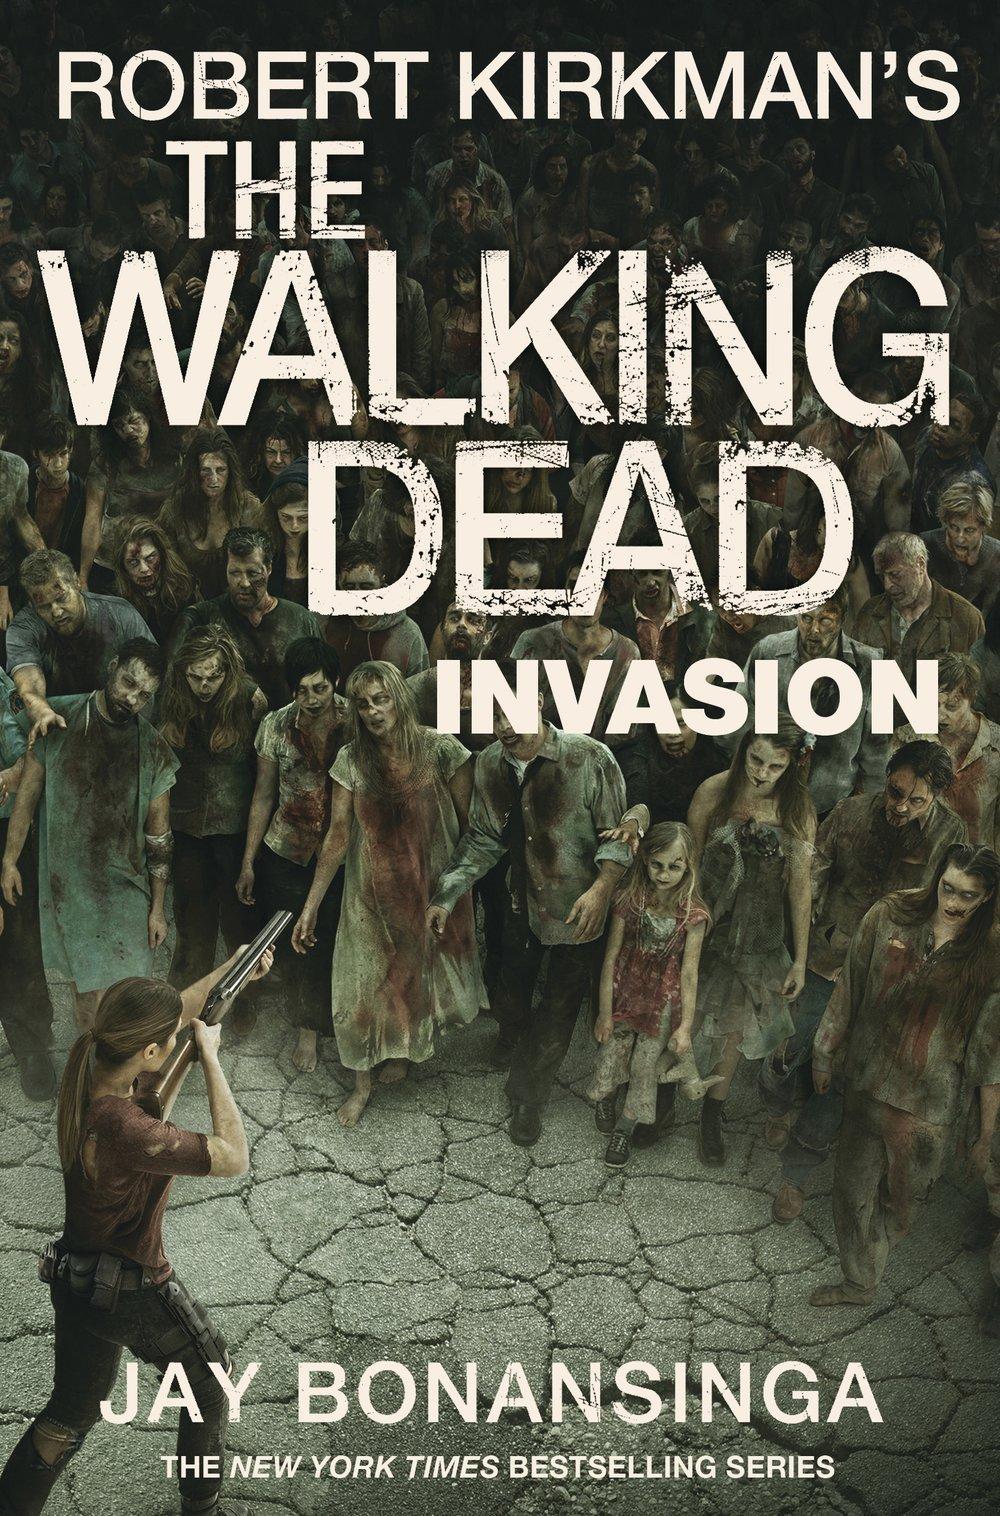 9781447275763The Walking Dead Invasion.jpg